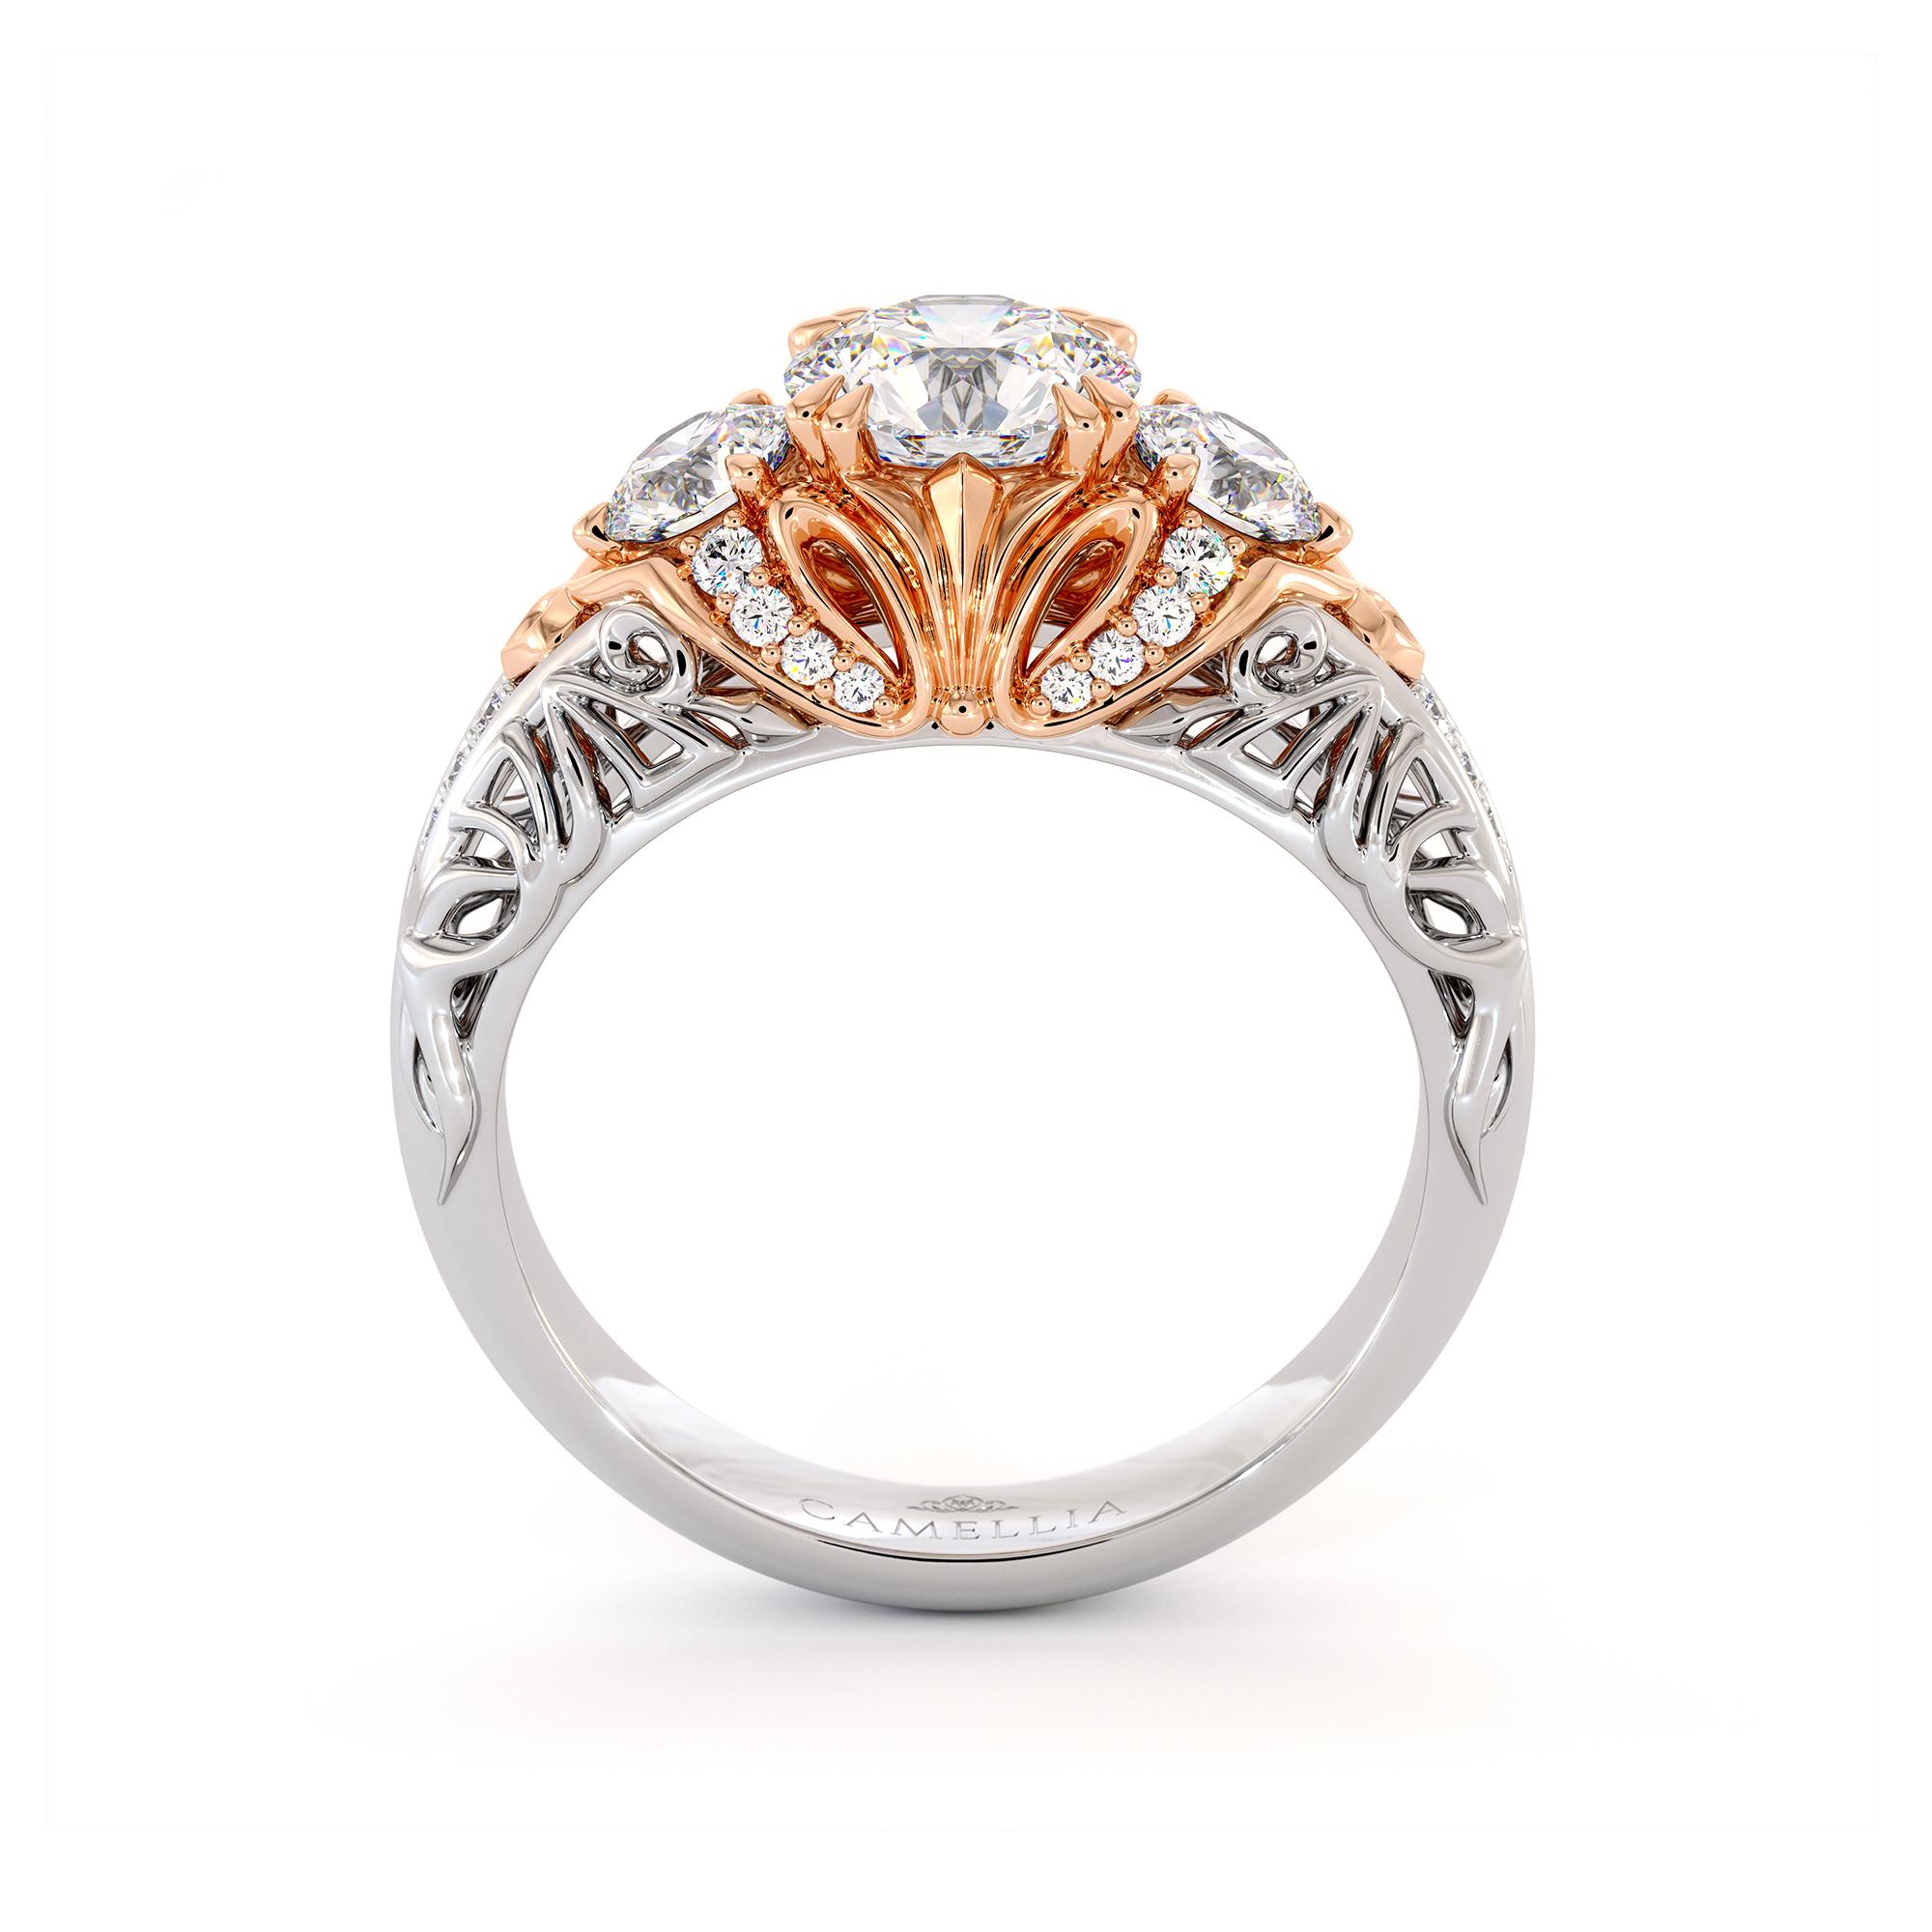 Unique Three Stone Queenly Engagement Ring